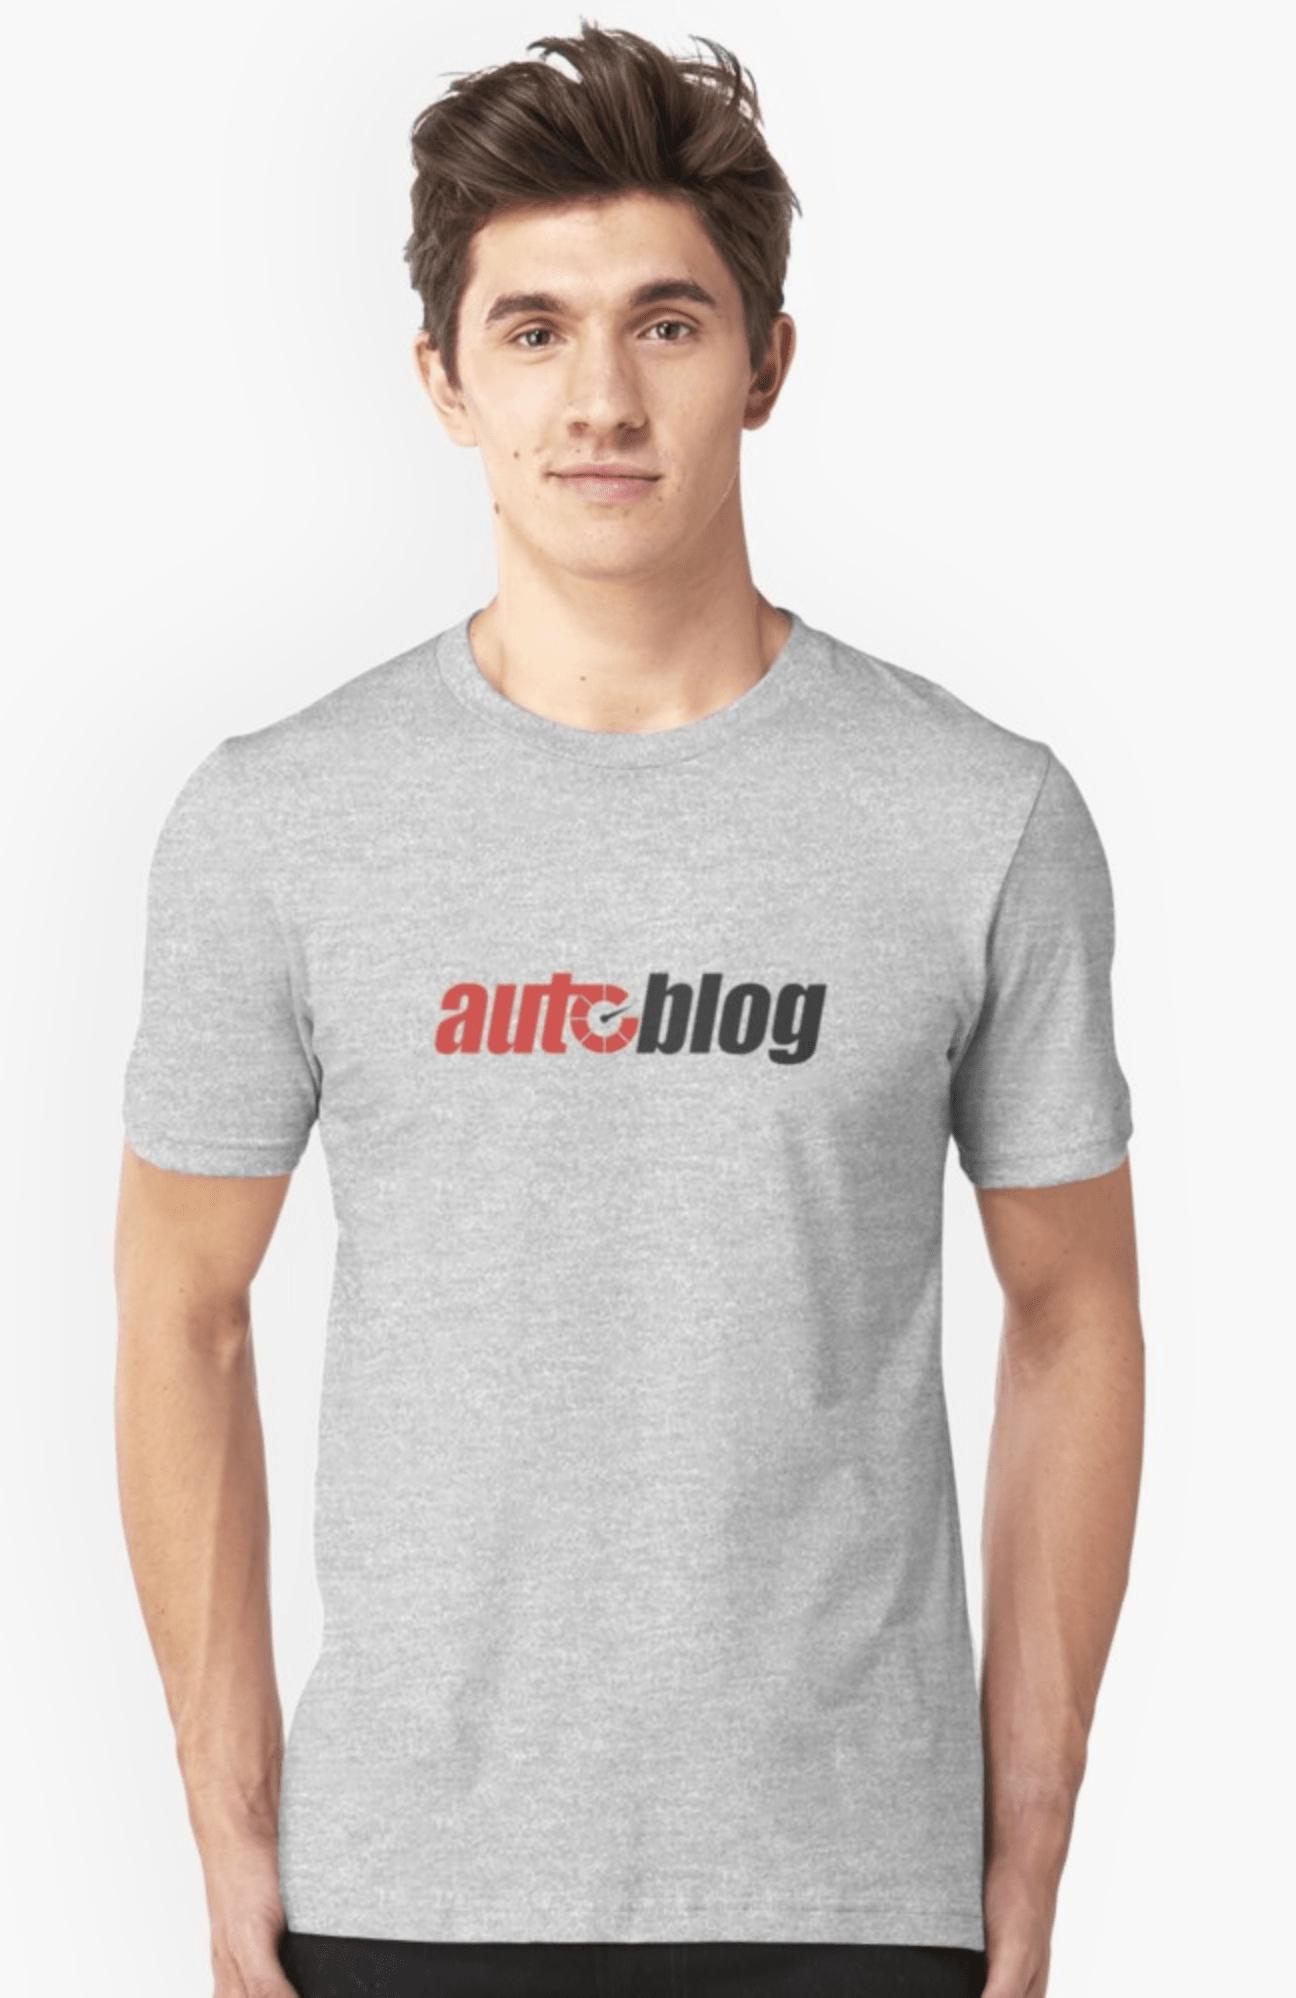 Autoblog